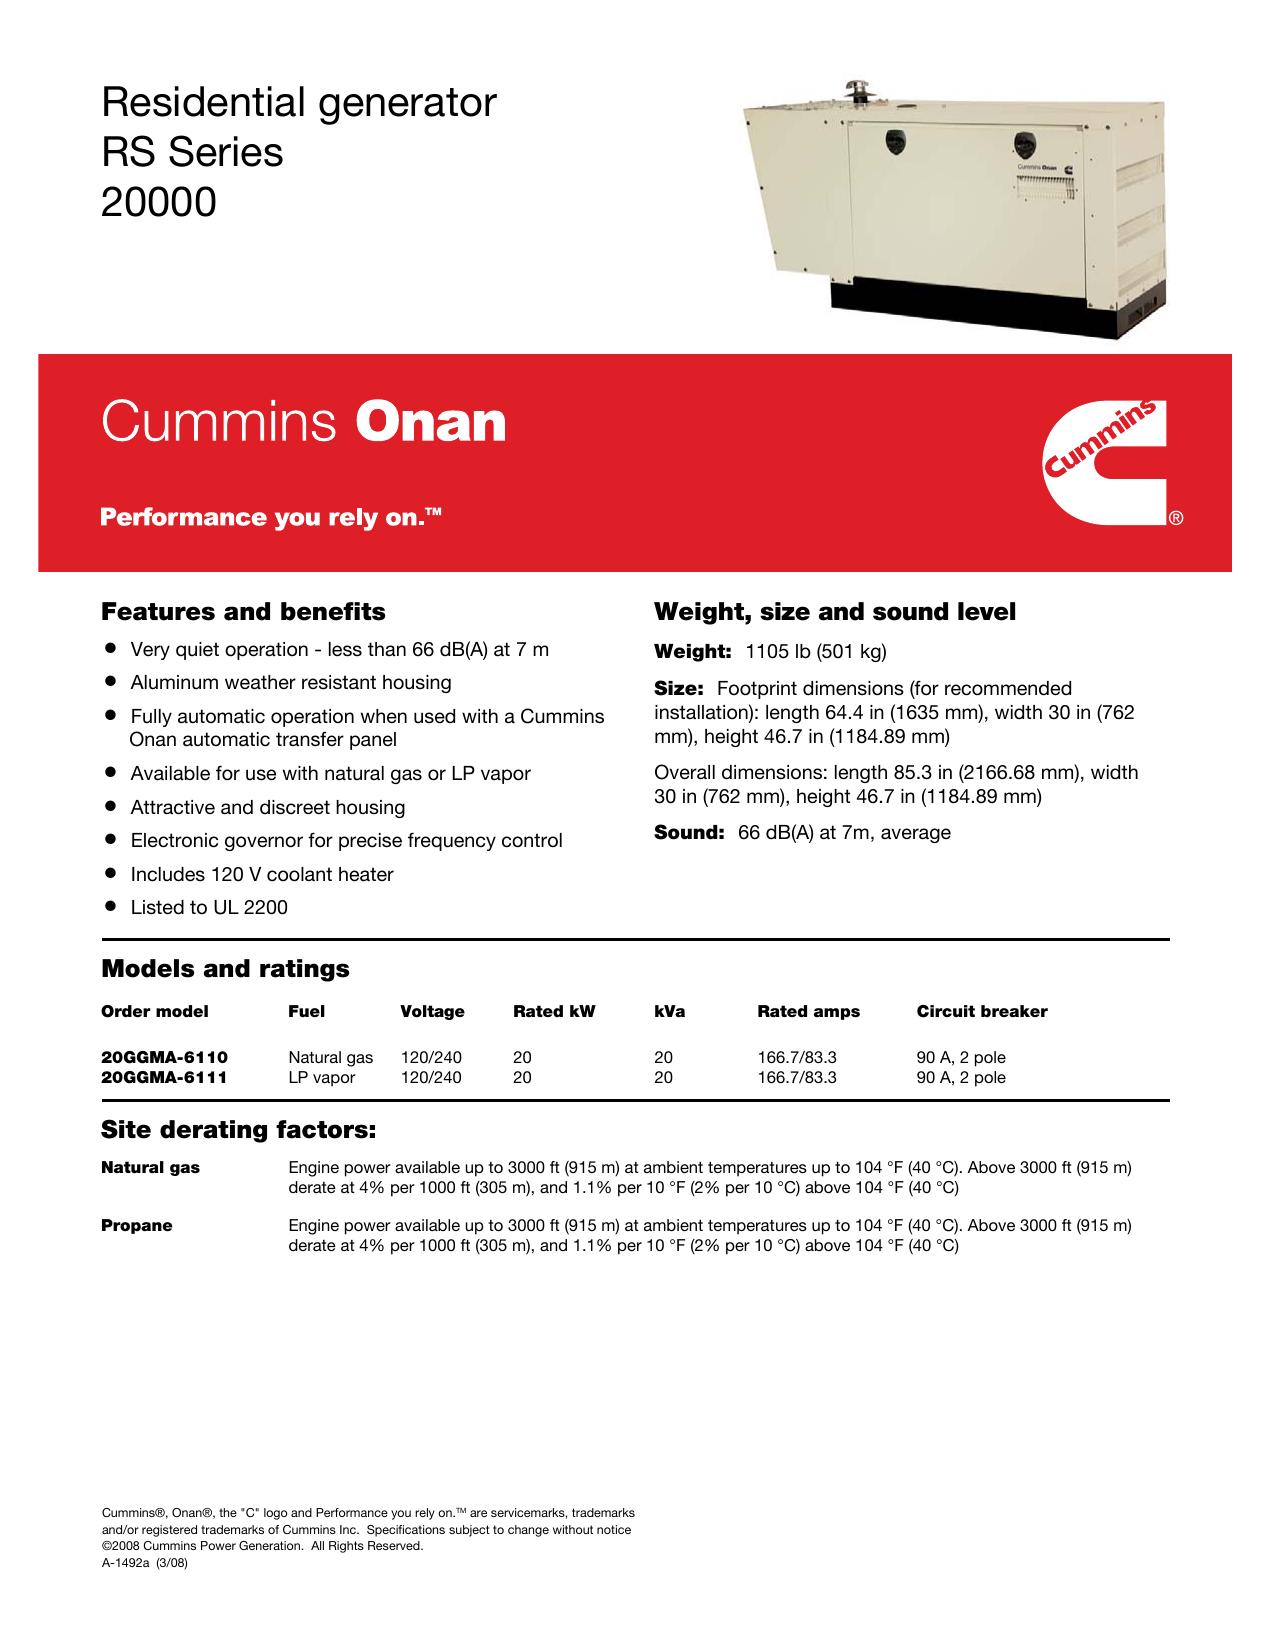 Residential Generator Rs Series 20000 Manualzz